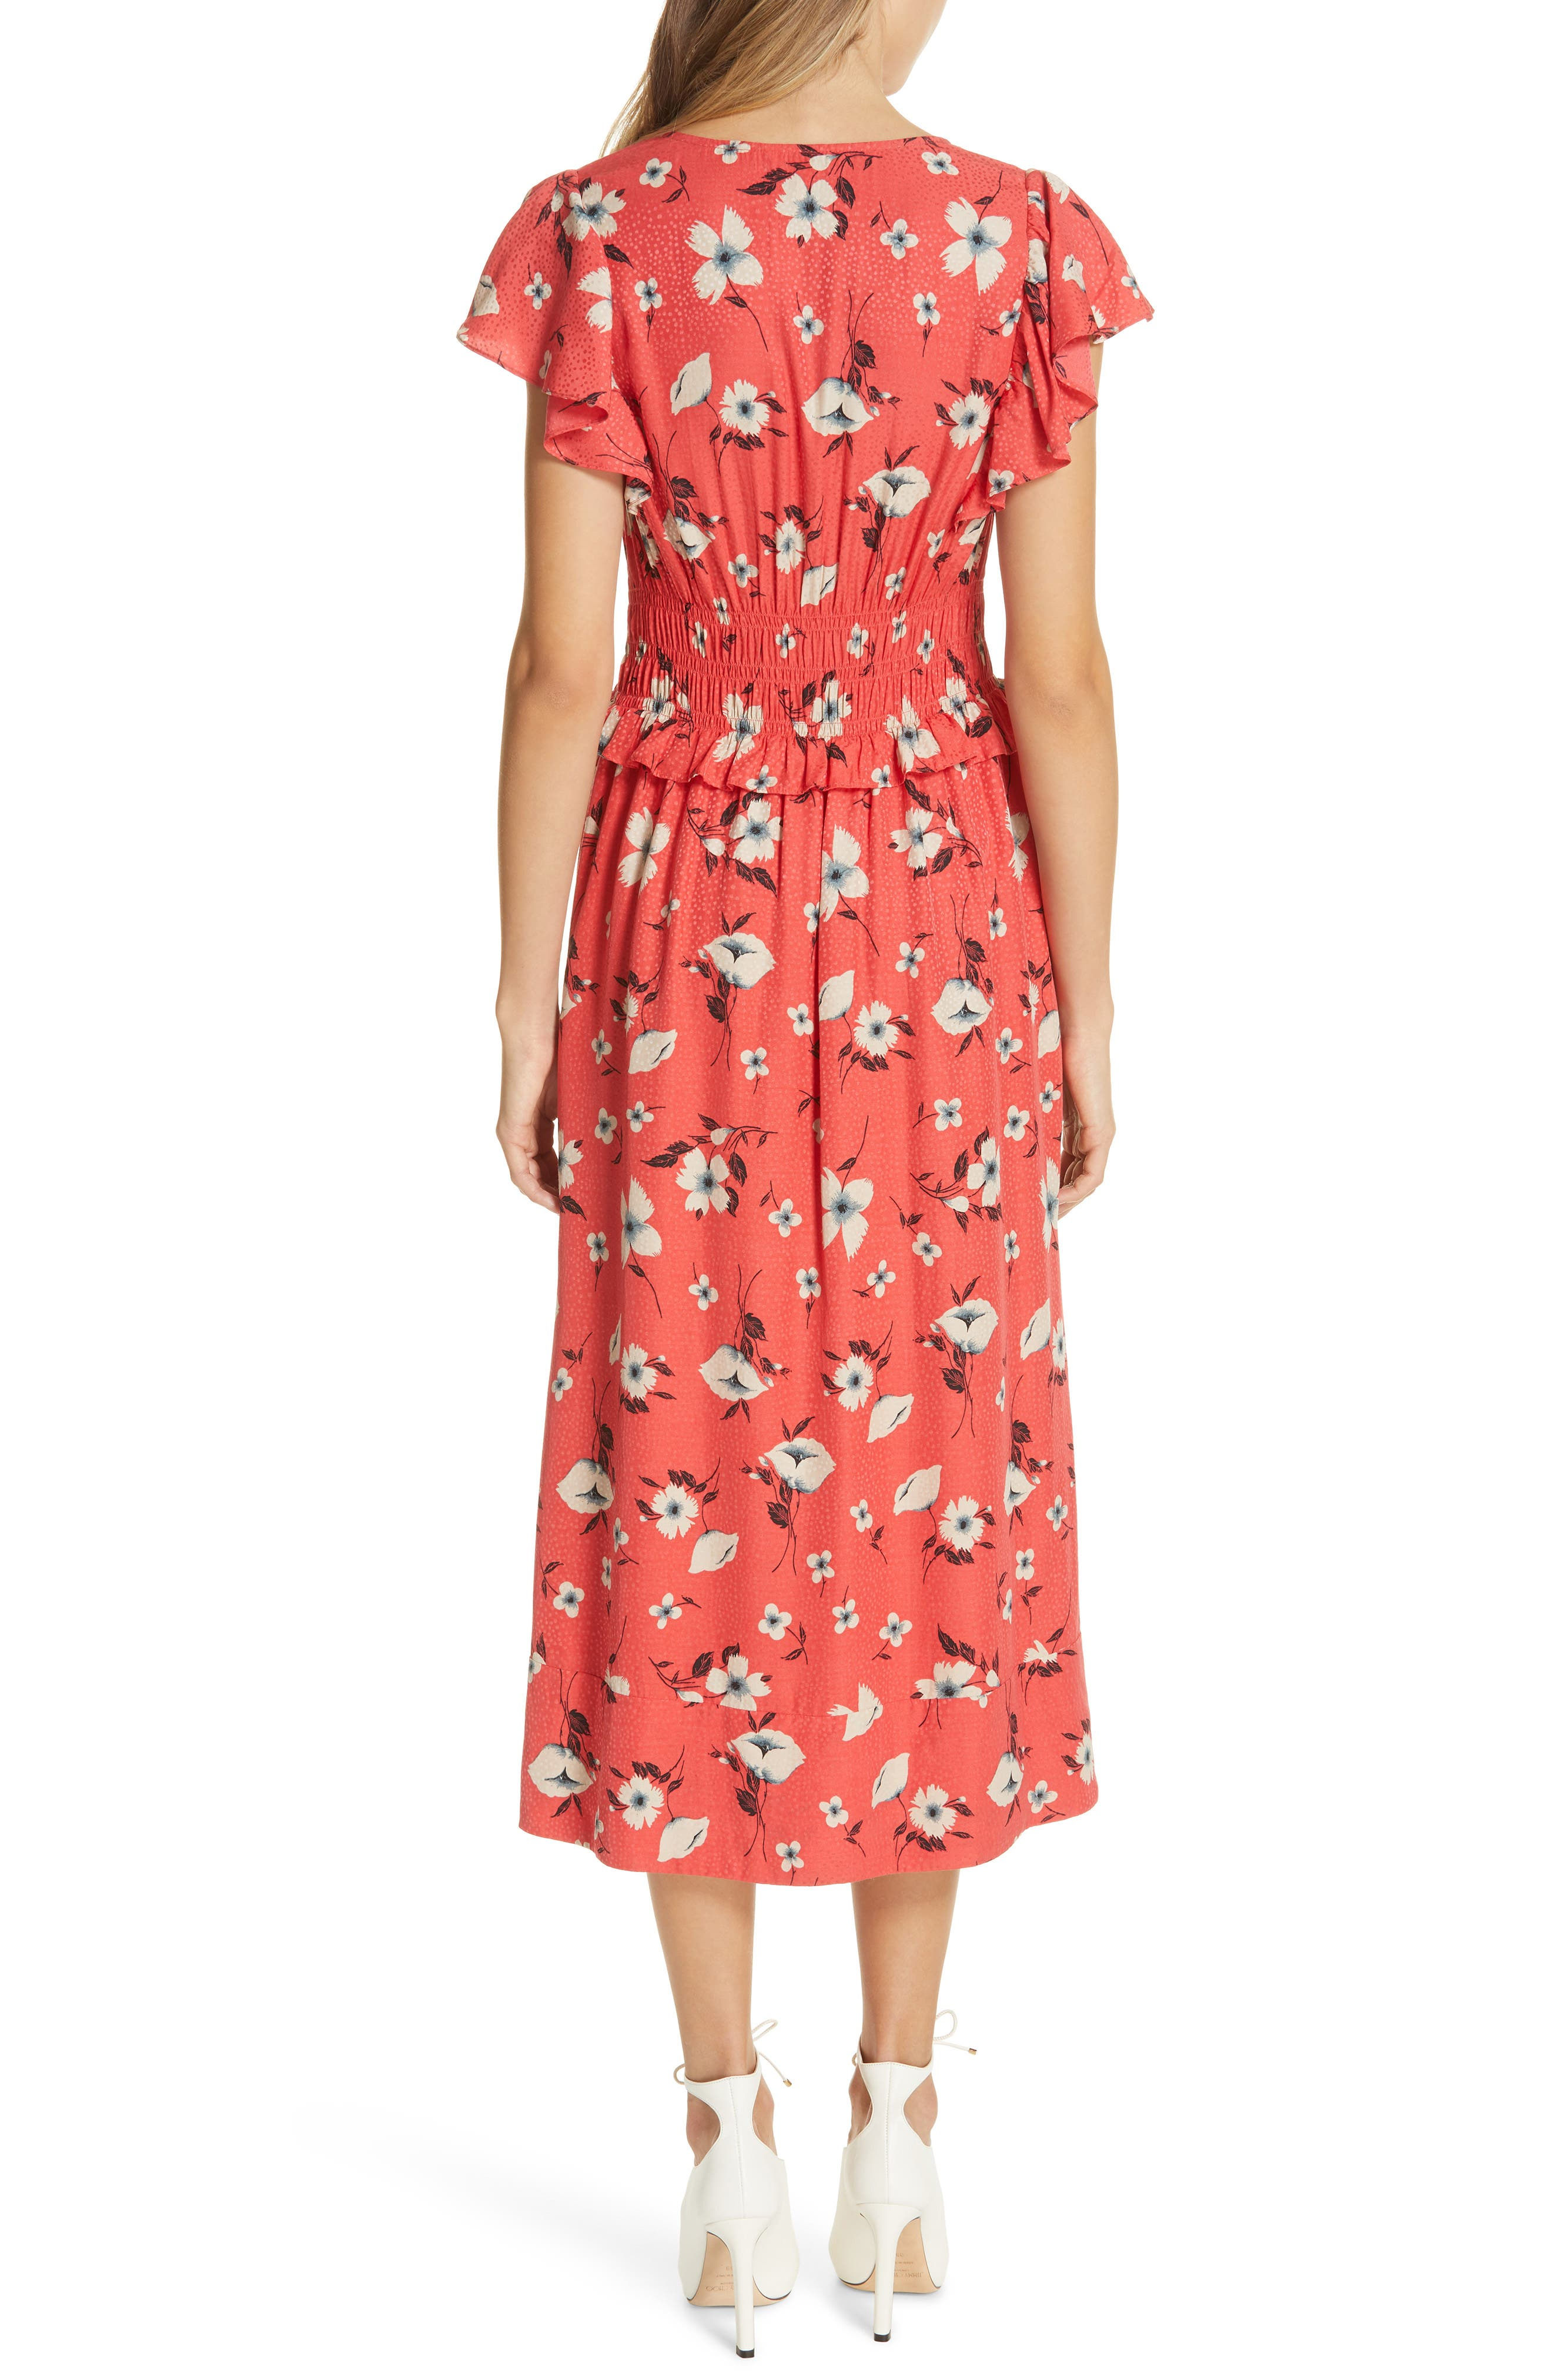 REBECCA TAYLOR, Daniella Floral Jacquard Silk Blend Dress, Alternate thumbnail 2, color, PUNCH COMBO